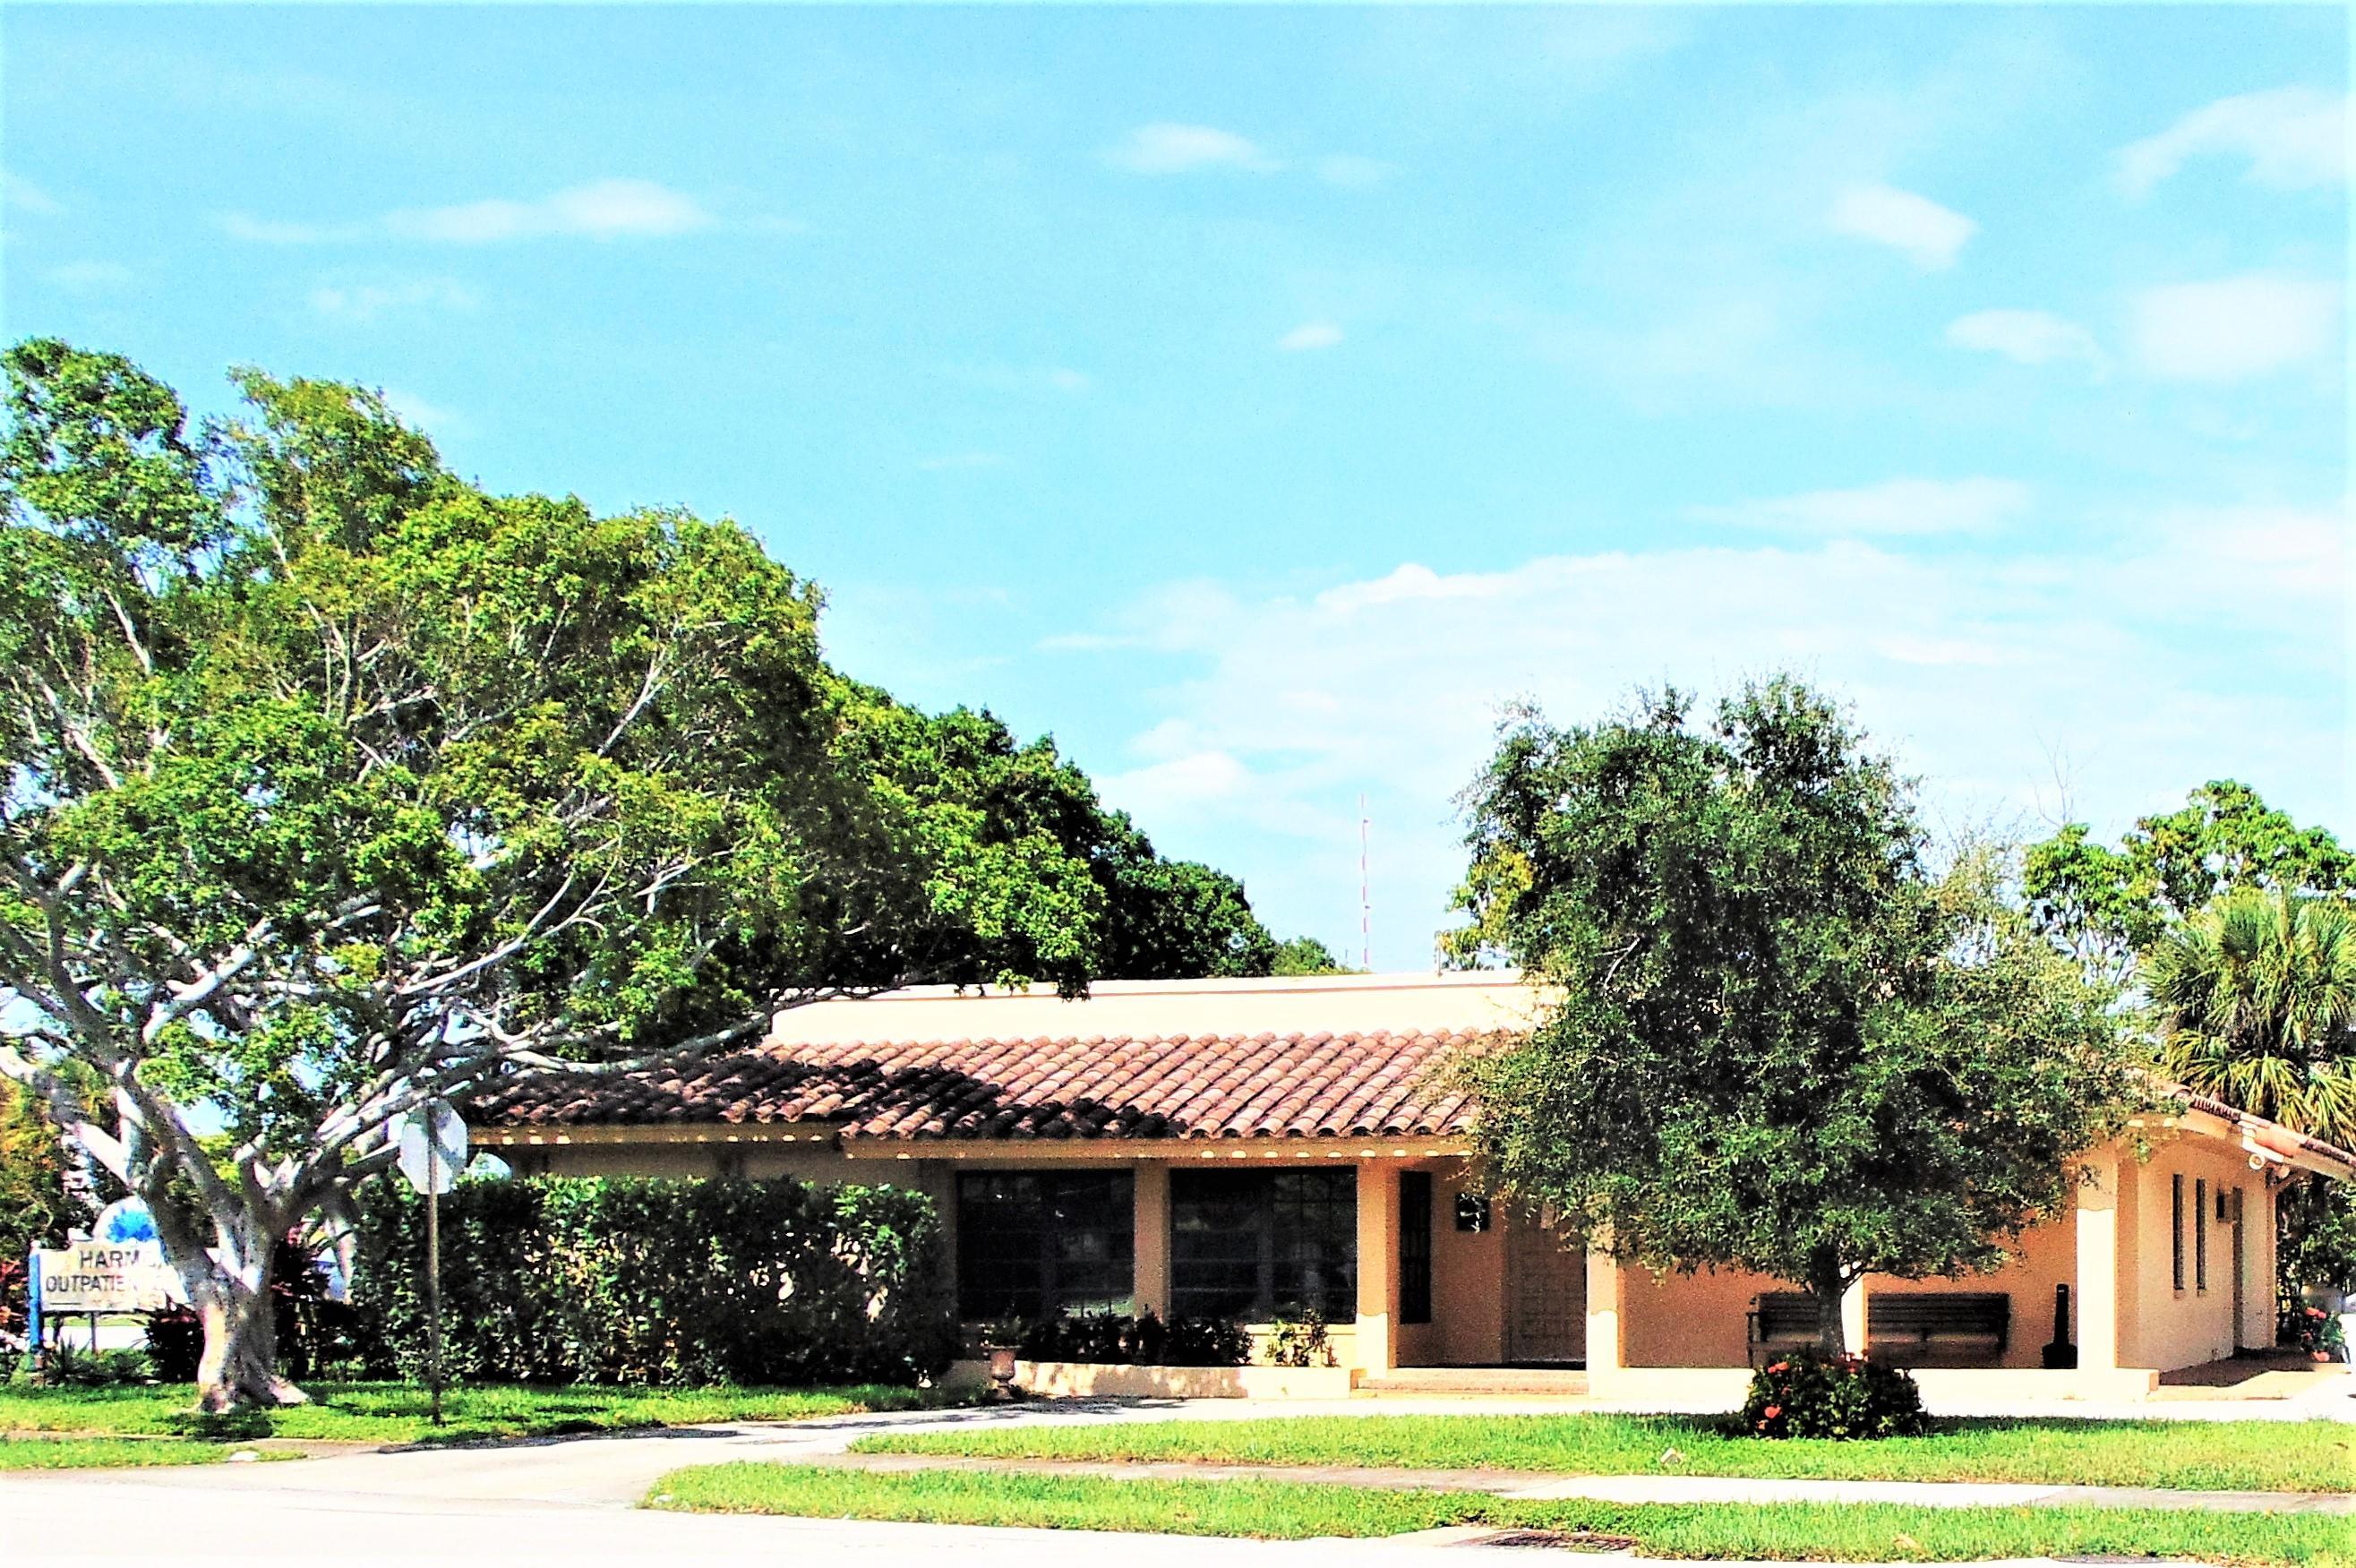 300 George Bush Boulevard, Delray Beach, Florida 33444, ,2 BathroomsBathrooms,Commercial Industrial,For Sale,George Bush,RX-10638214